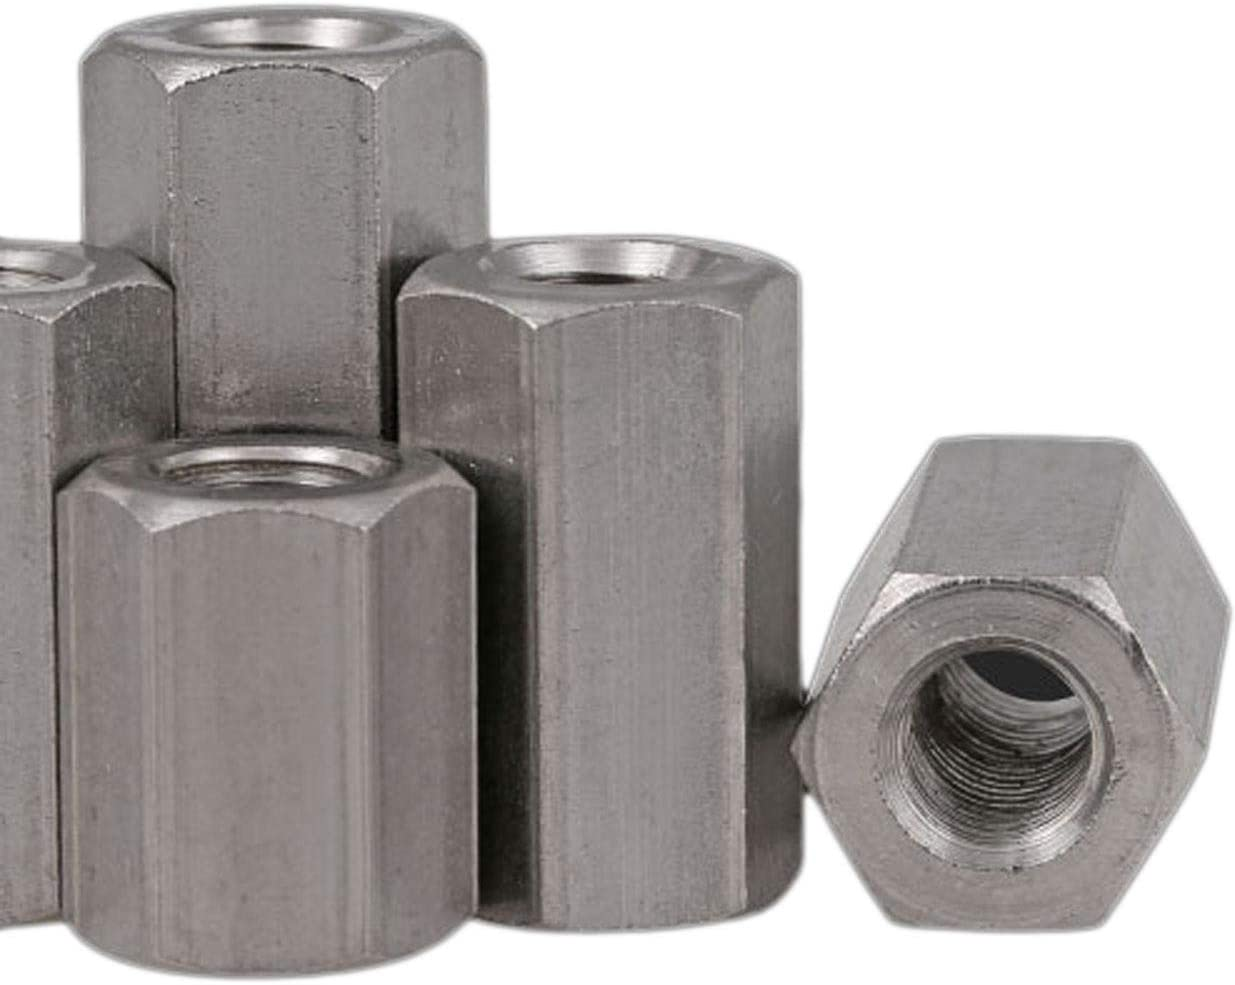 5pcs M8 x 1.25 x 40mm Long Rod Coupling Hex Nut Connector Zinc Plated